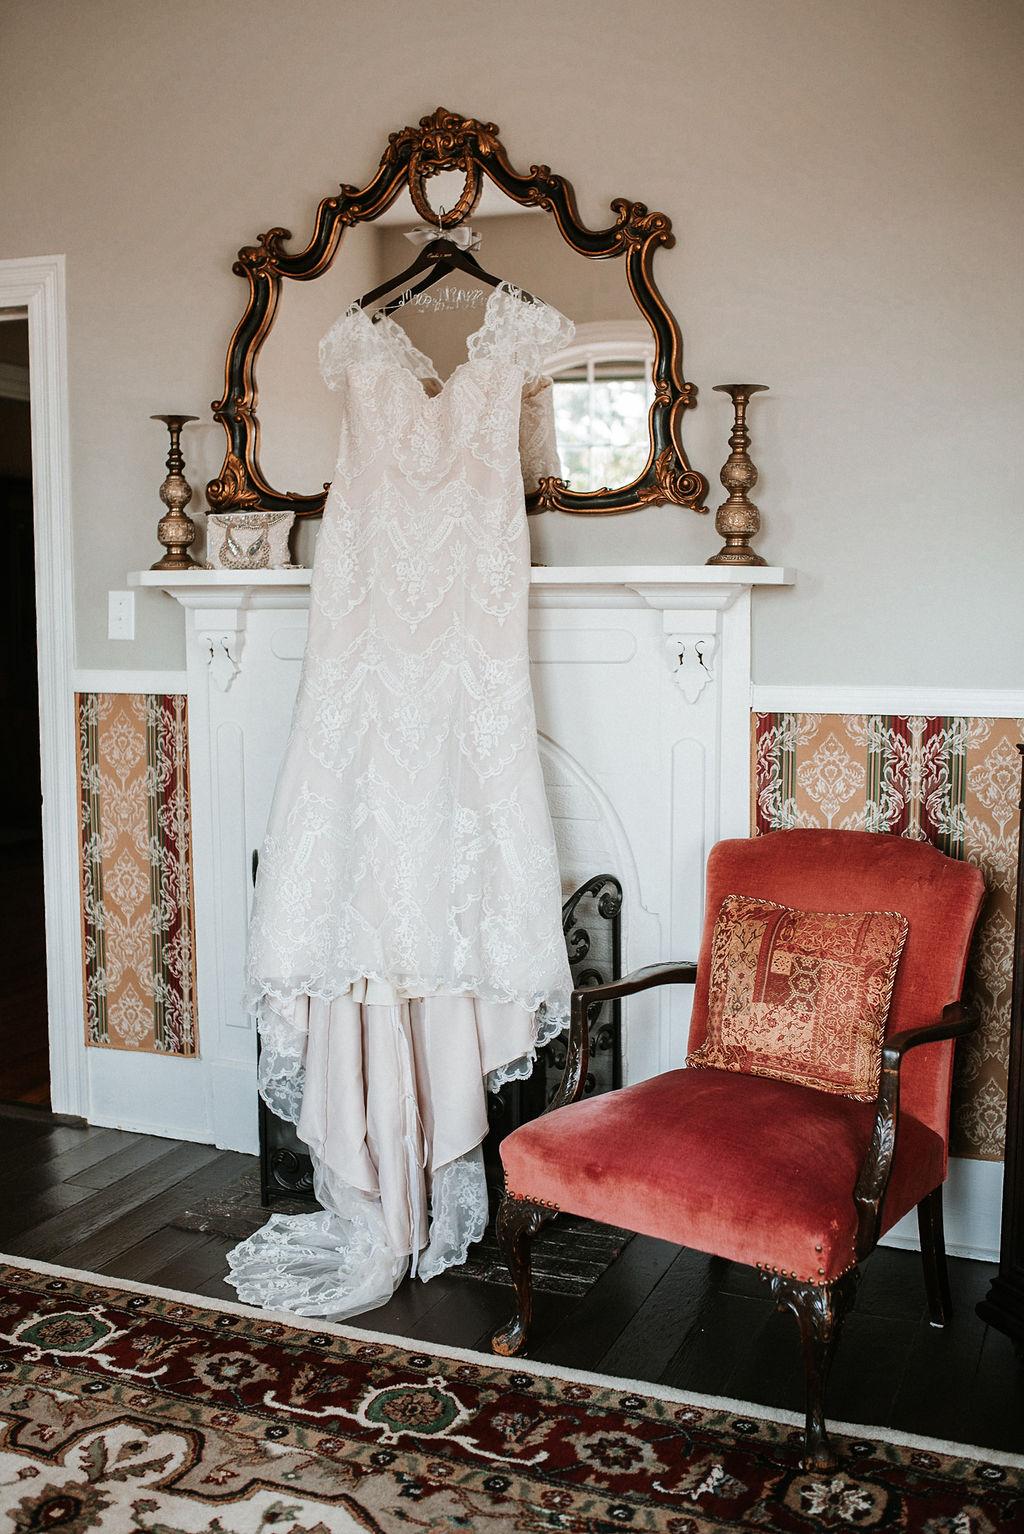 Detaio Shot of Wedding Dress at Khimaira Farm